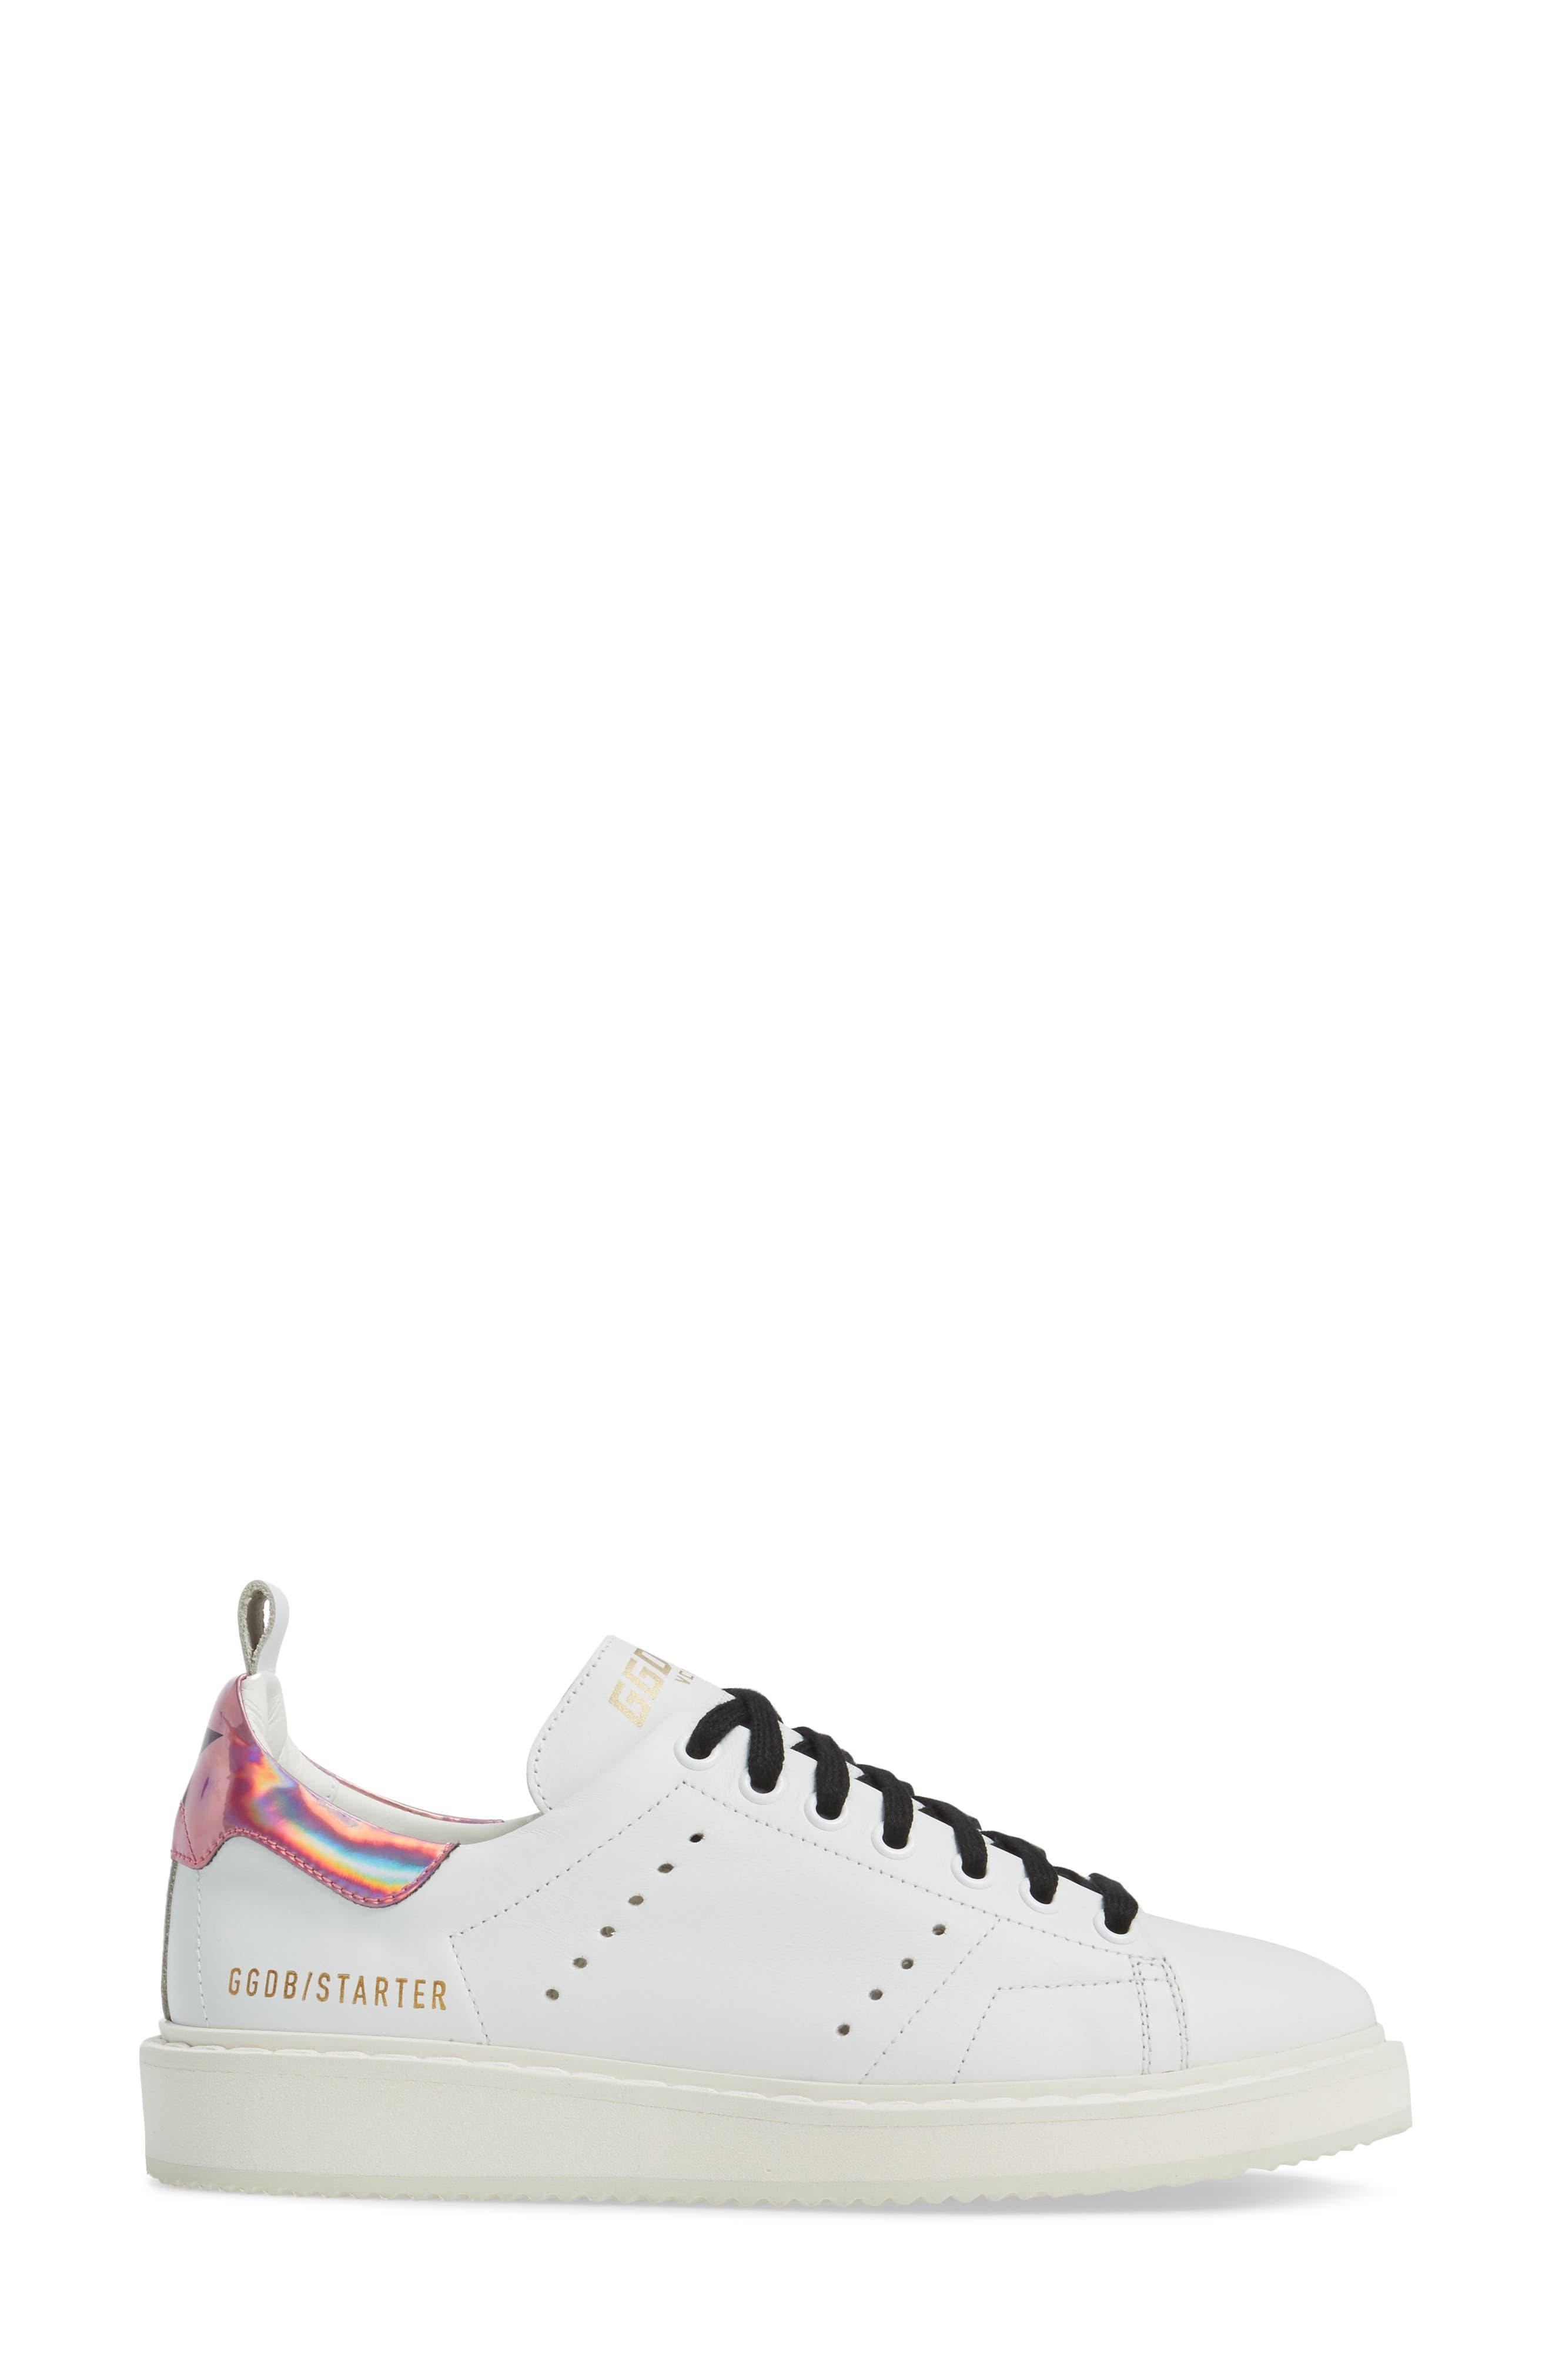 Alternate Image 3  - Golden Goose Starter Low Top Sneaker (Women)